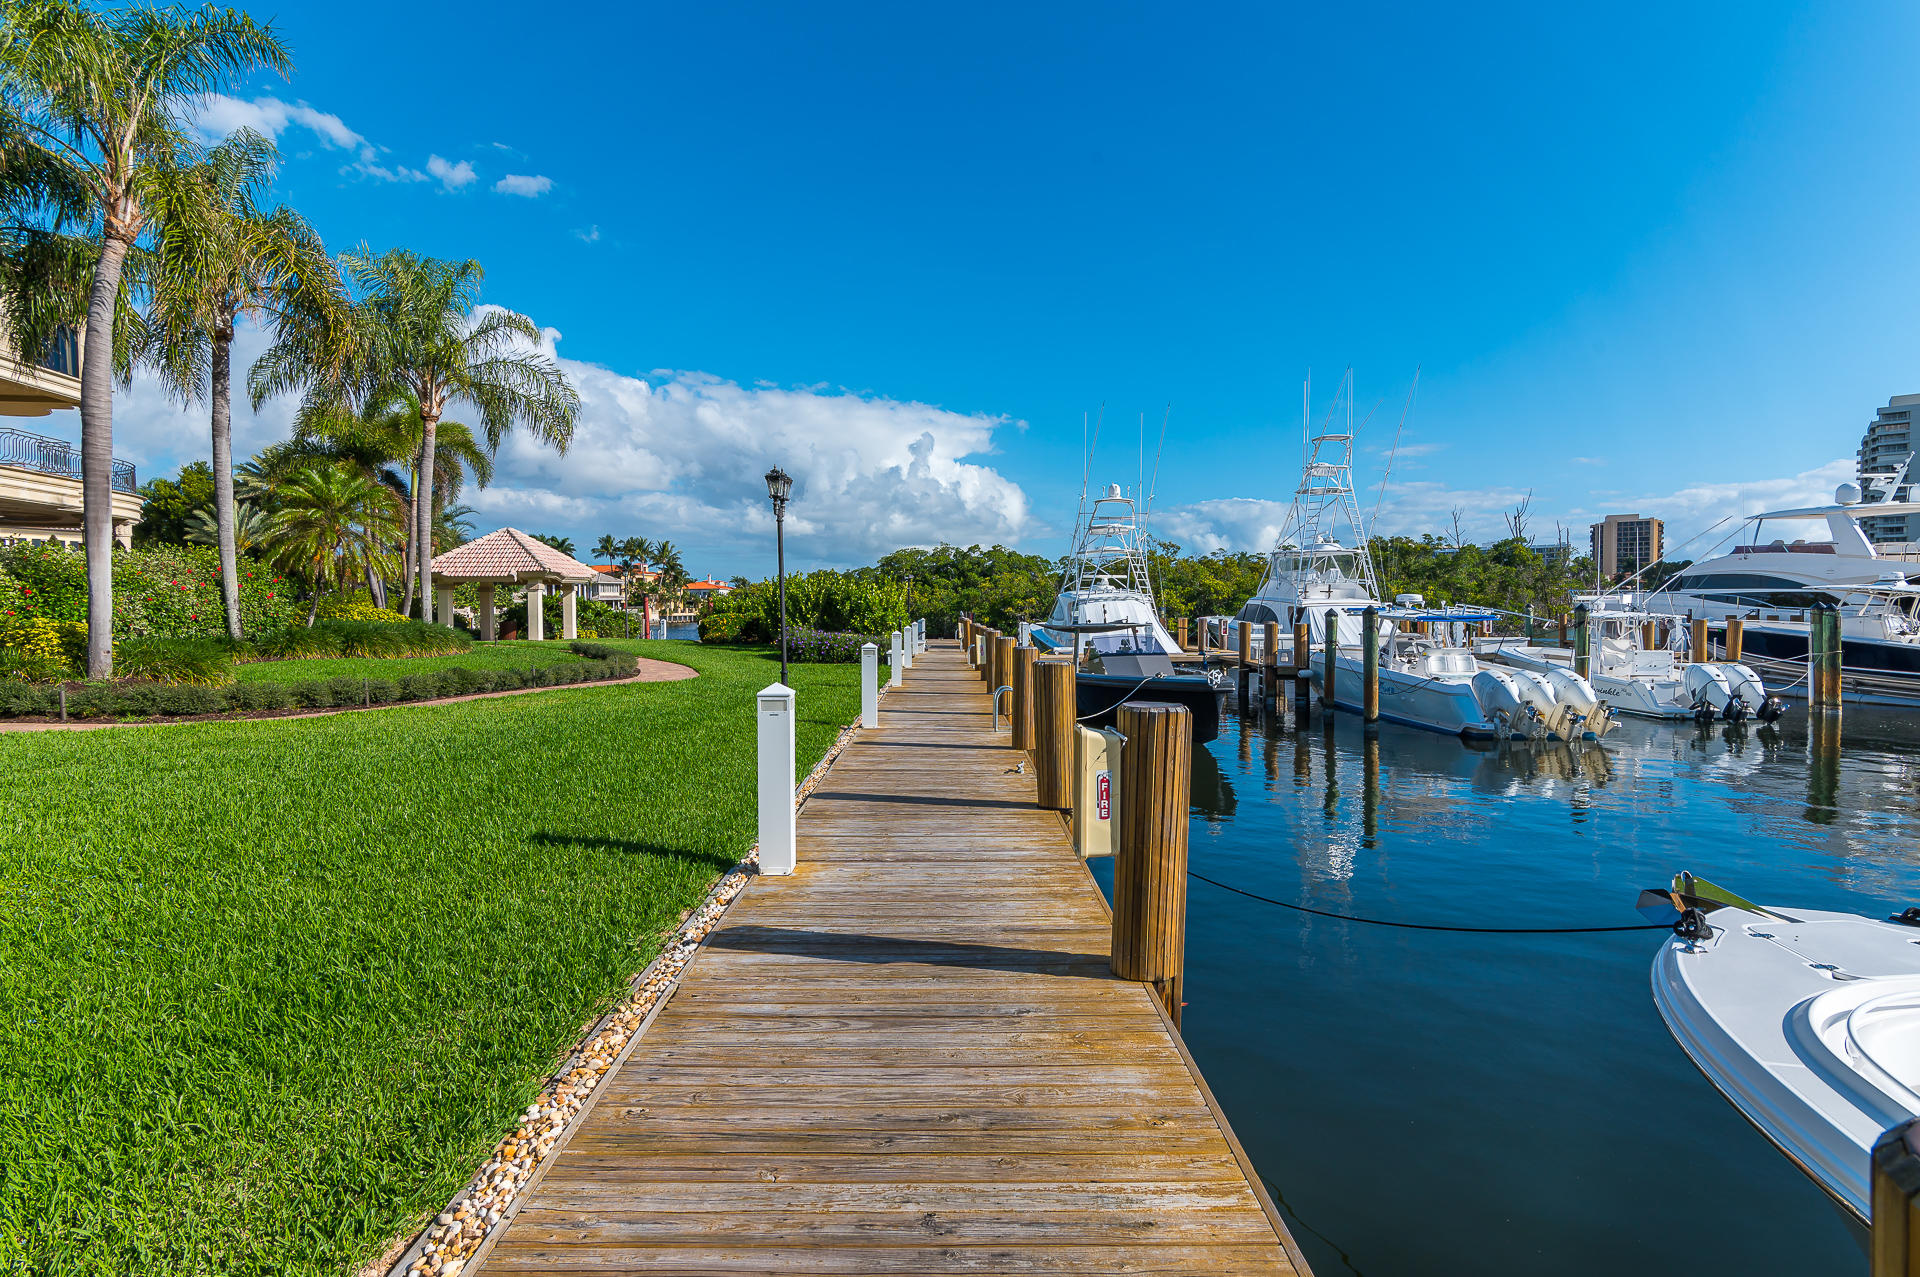 501 Sandpiper Way Boca Raton, FL 33431